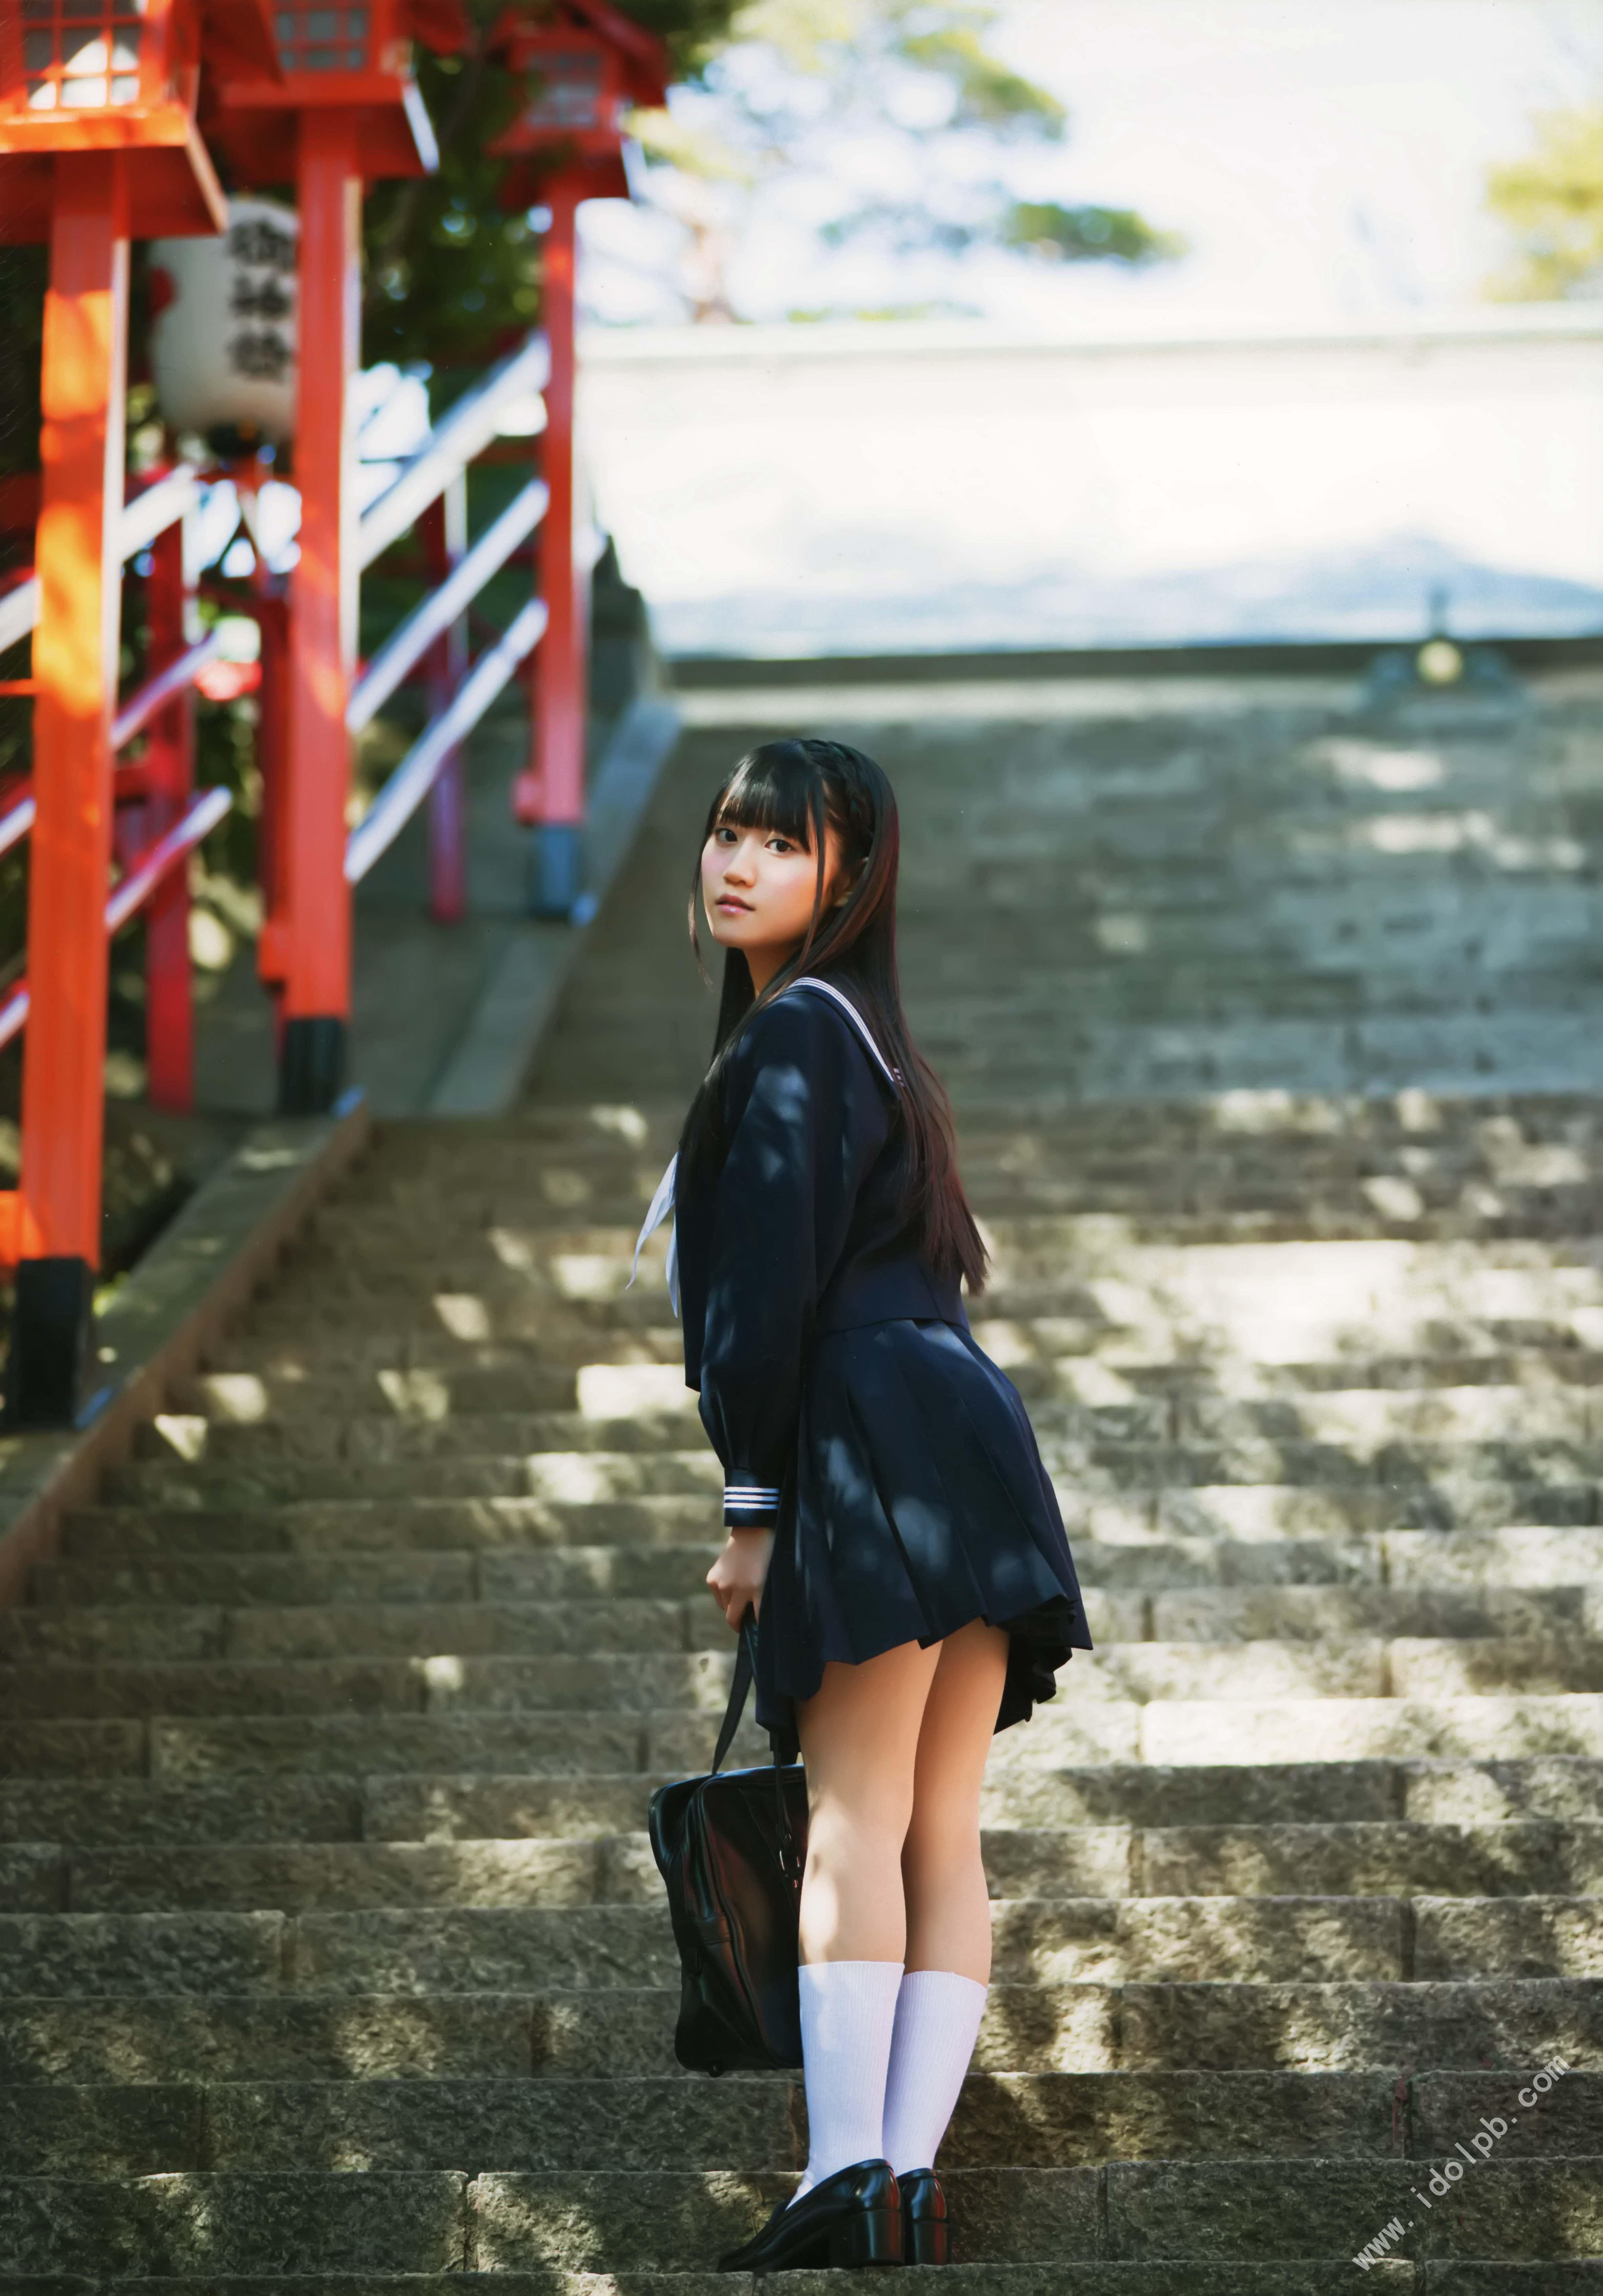 ogura_yui087.jpg